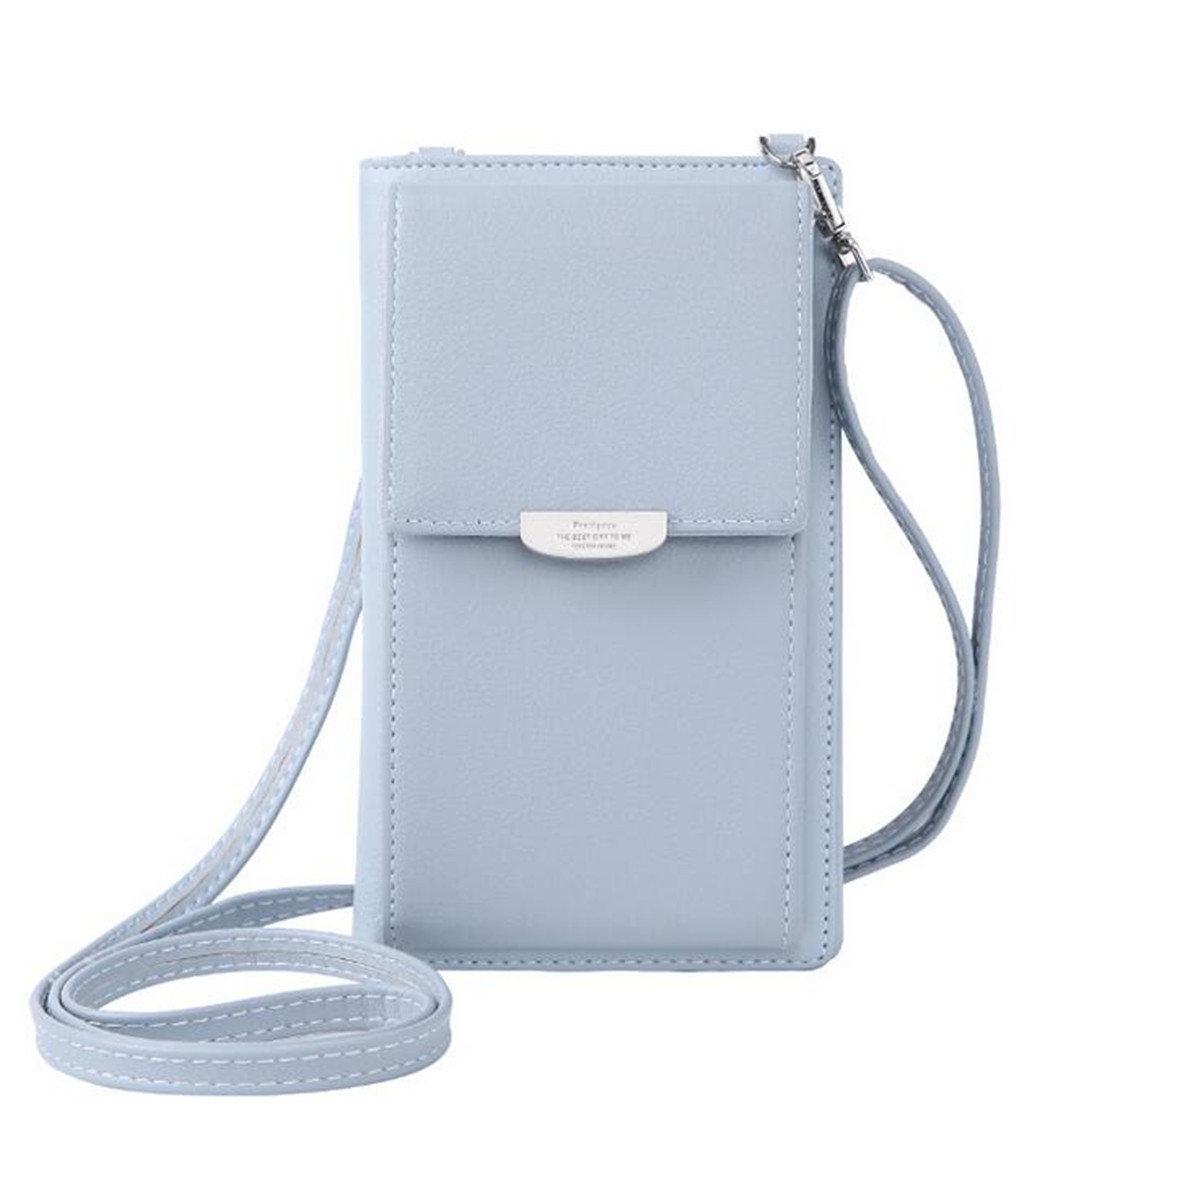 Women PU Leather Crossbody Wallet Coin Cell Phone Case Messenger Shoulder Bag